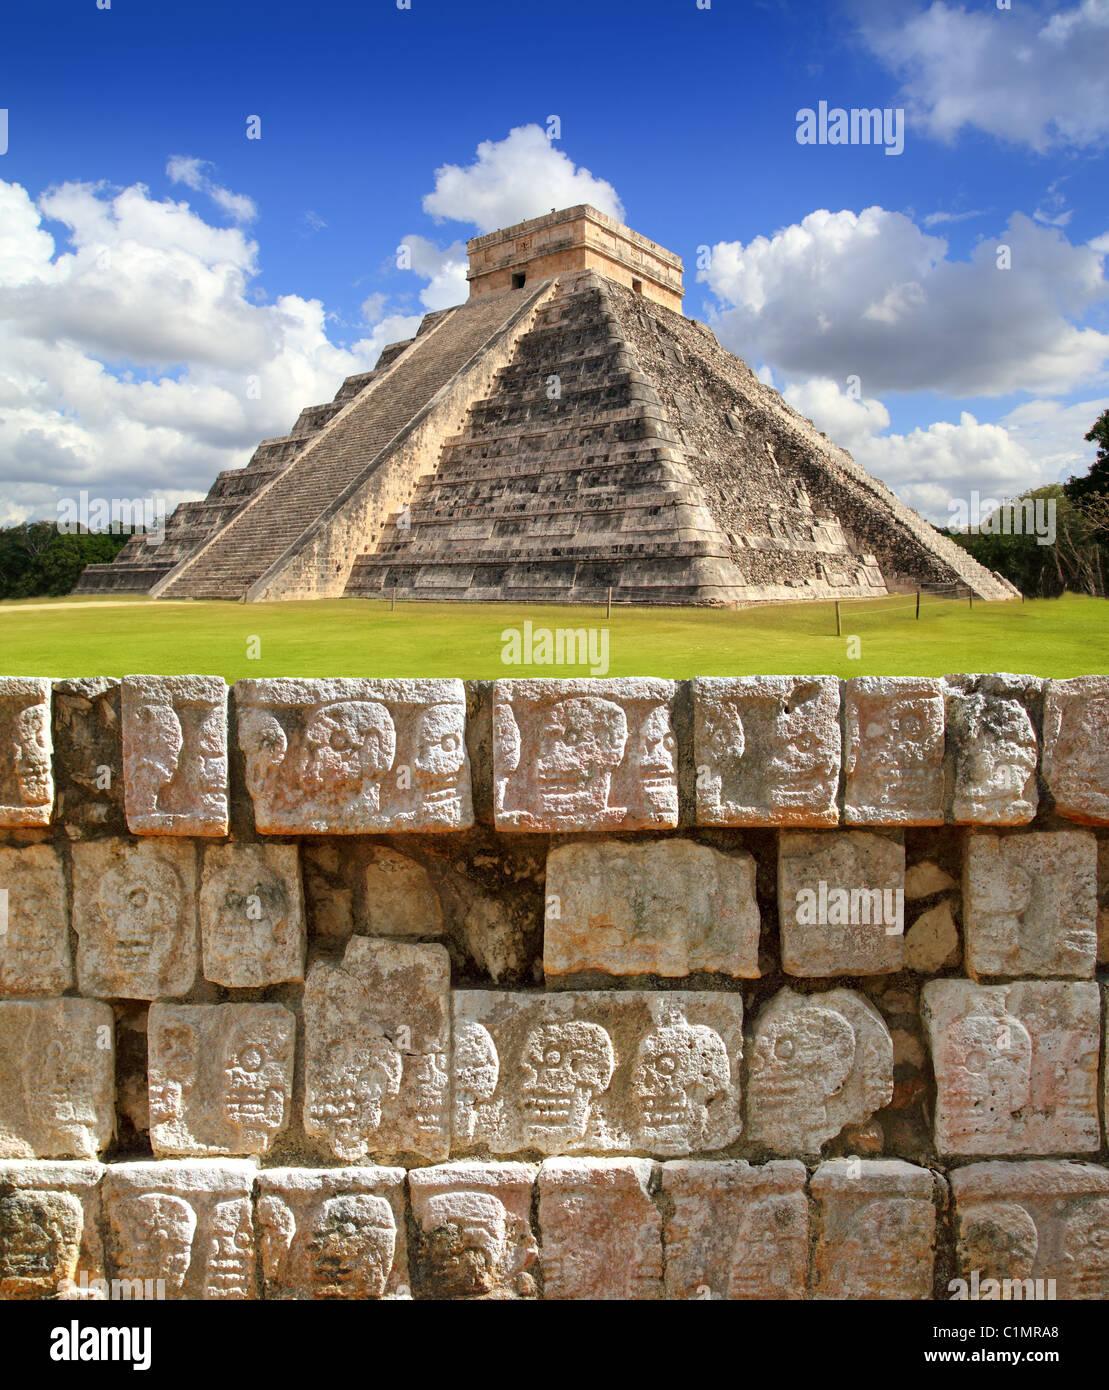 Chichen Itza Tzompantli le mur de crânes et pyramide Kukulkan Photo Stock